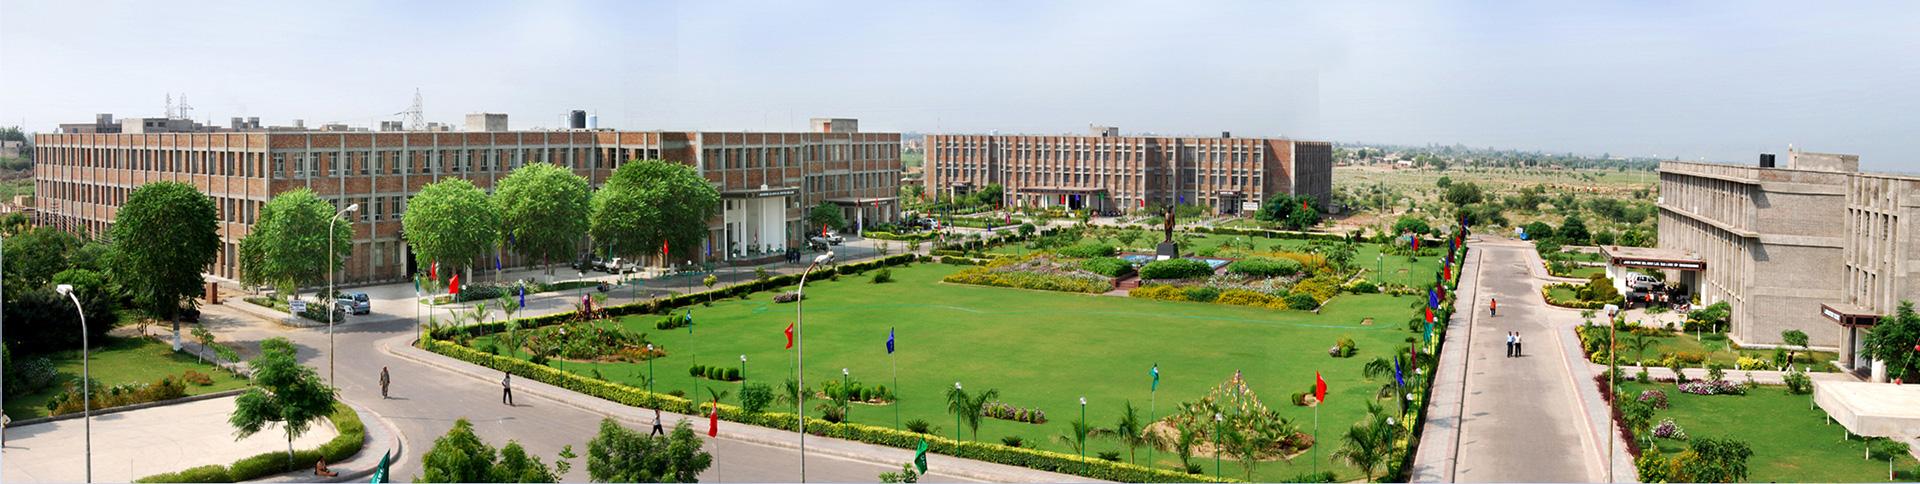 jcdm-engineering-college-sirsa